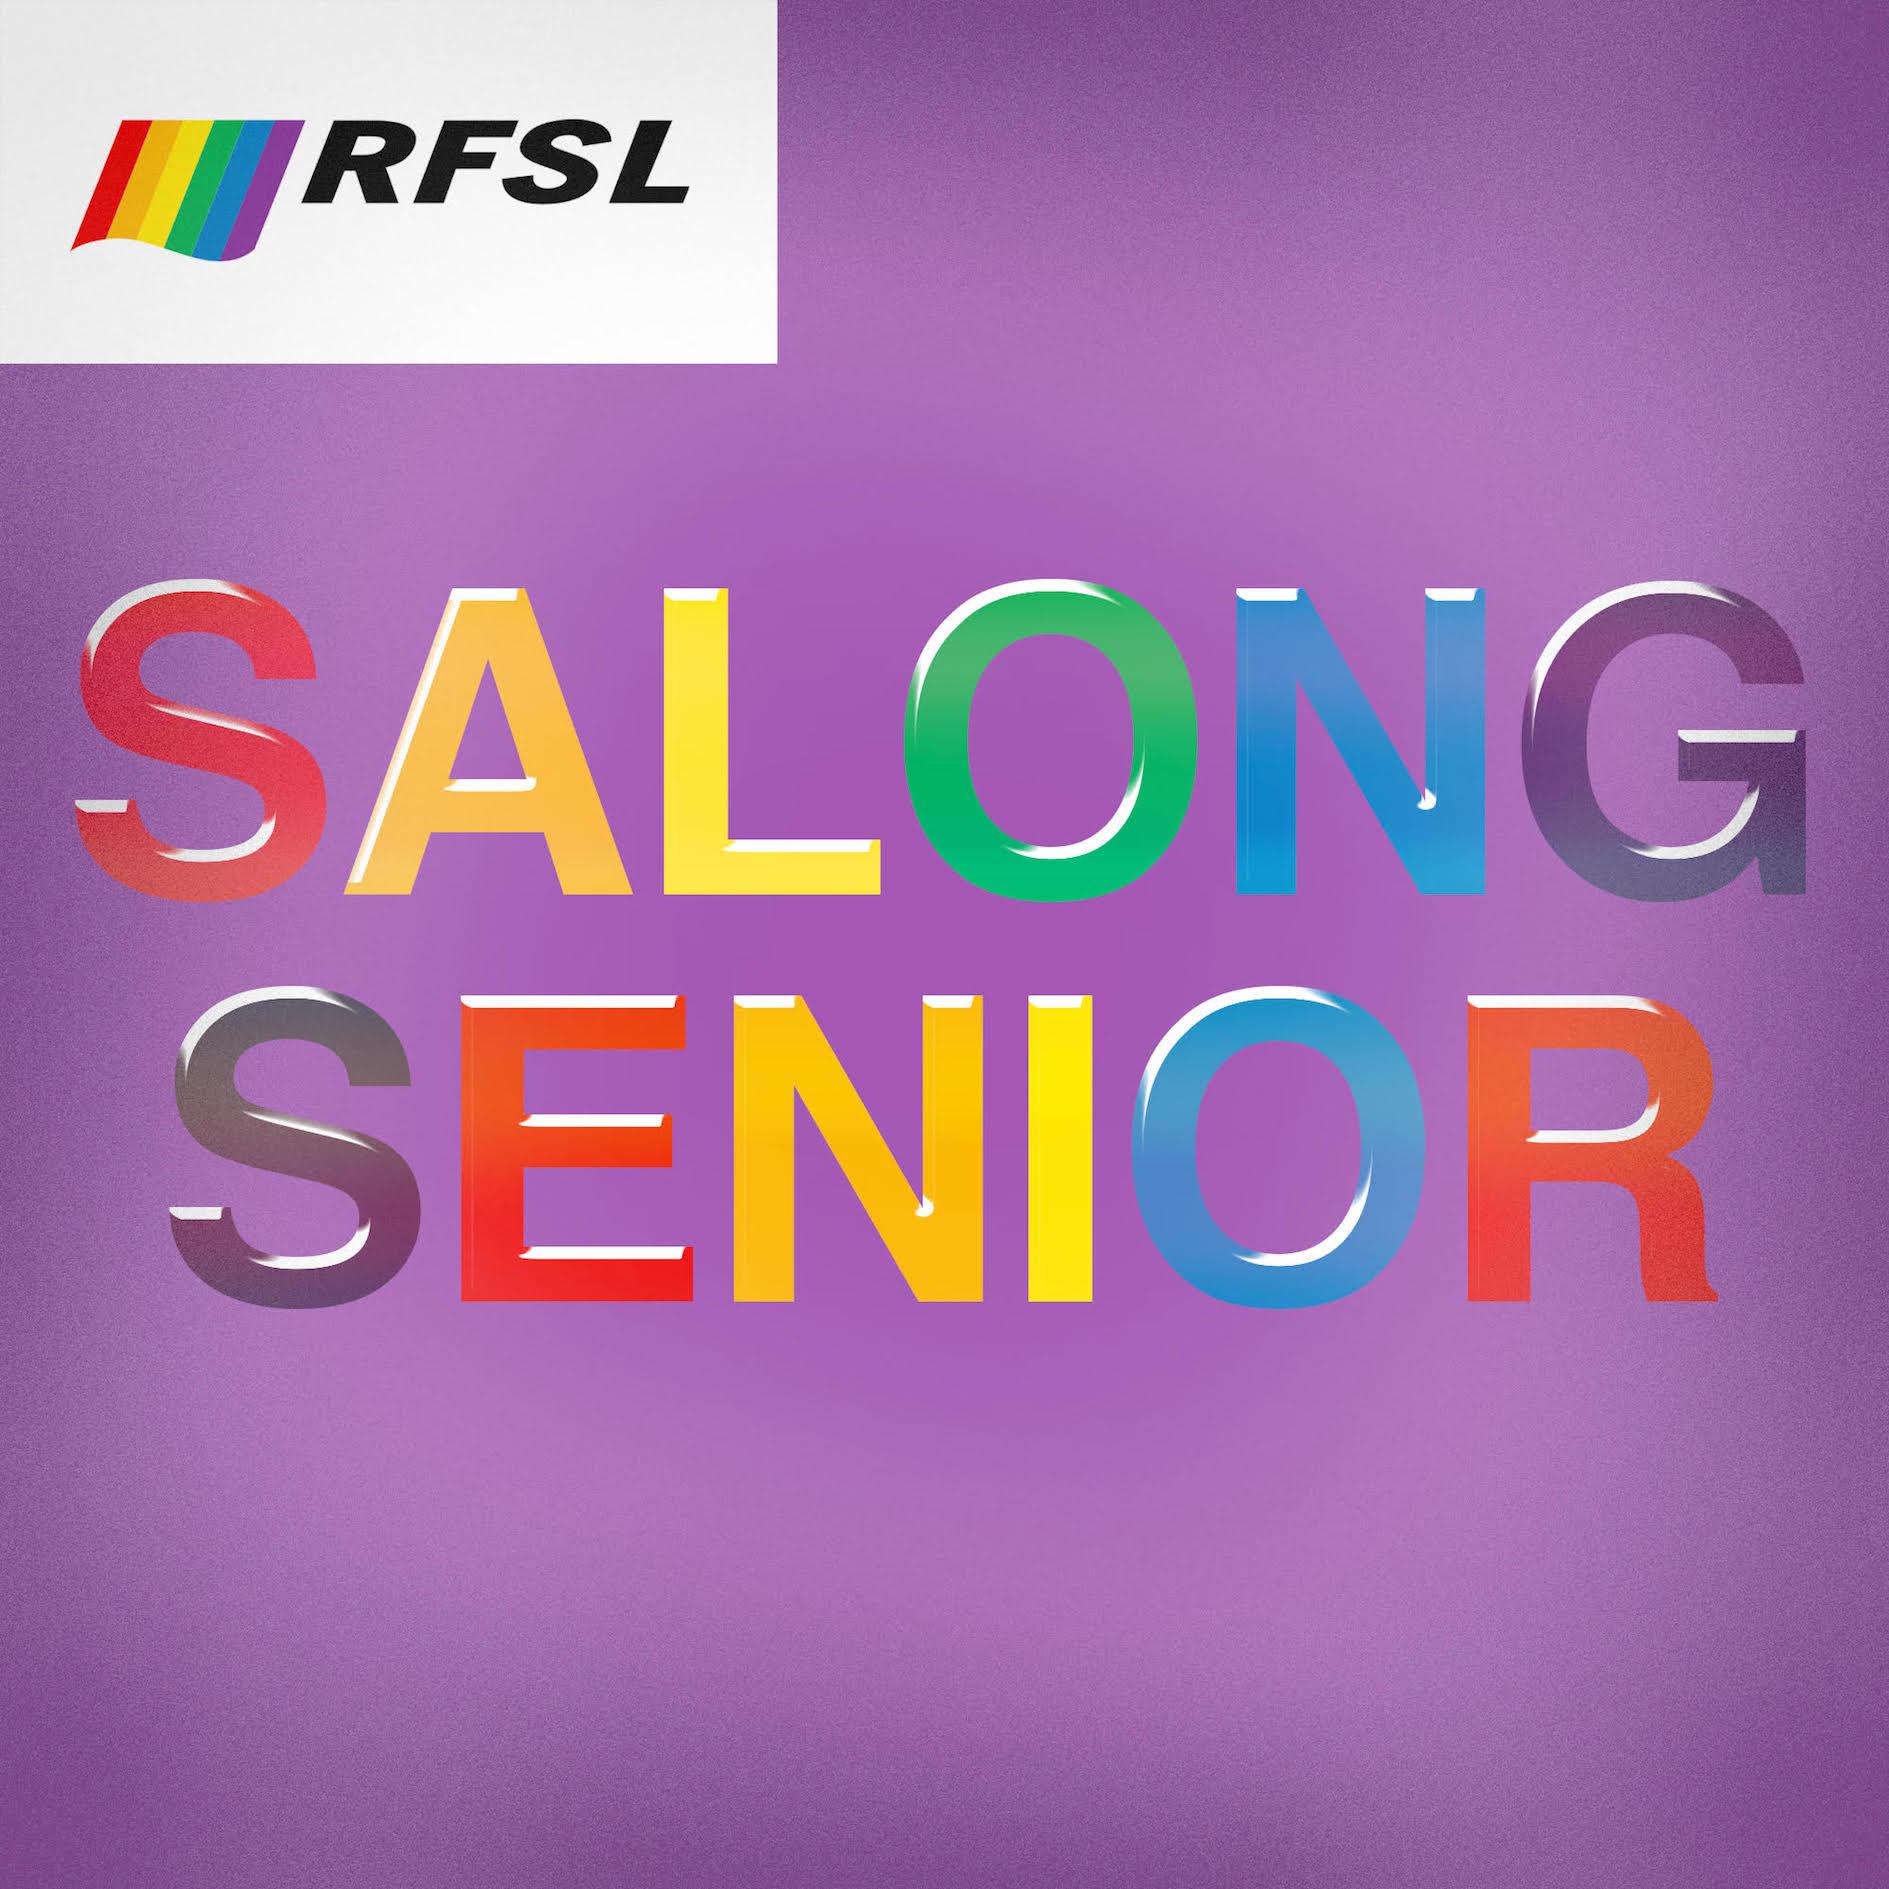 Salong Senior 5. Älta